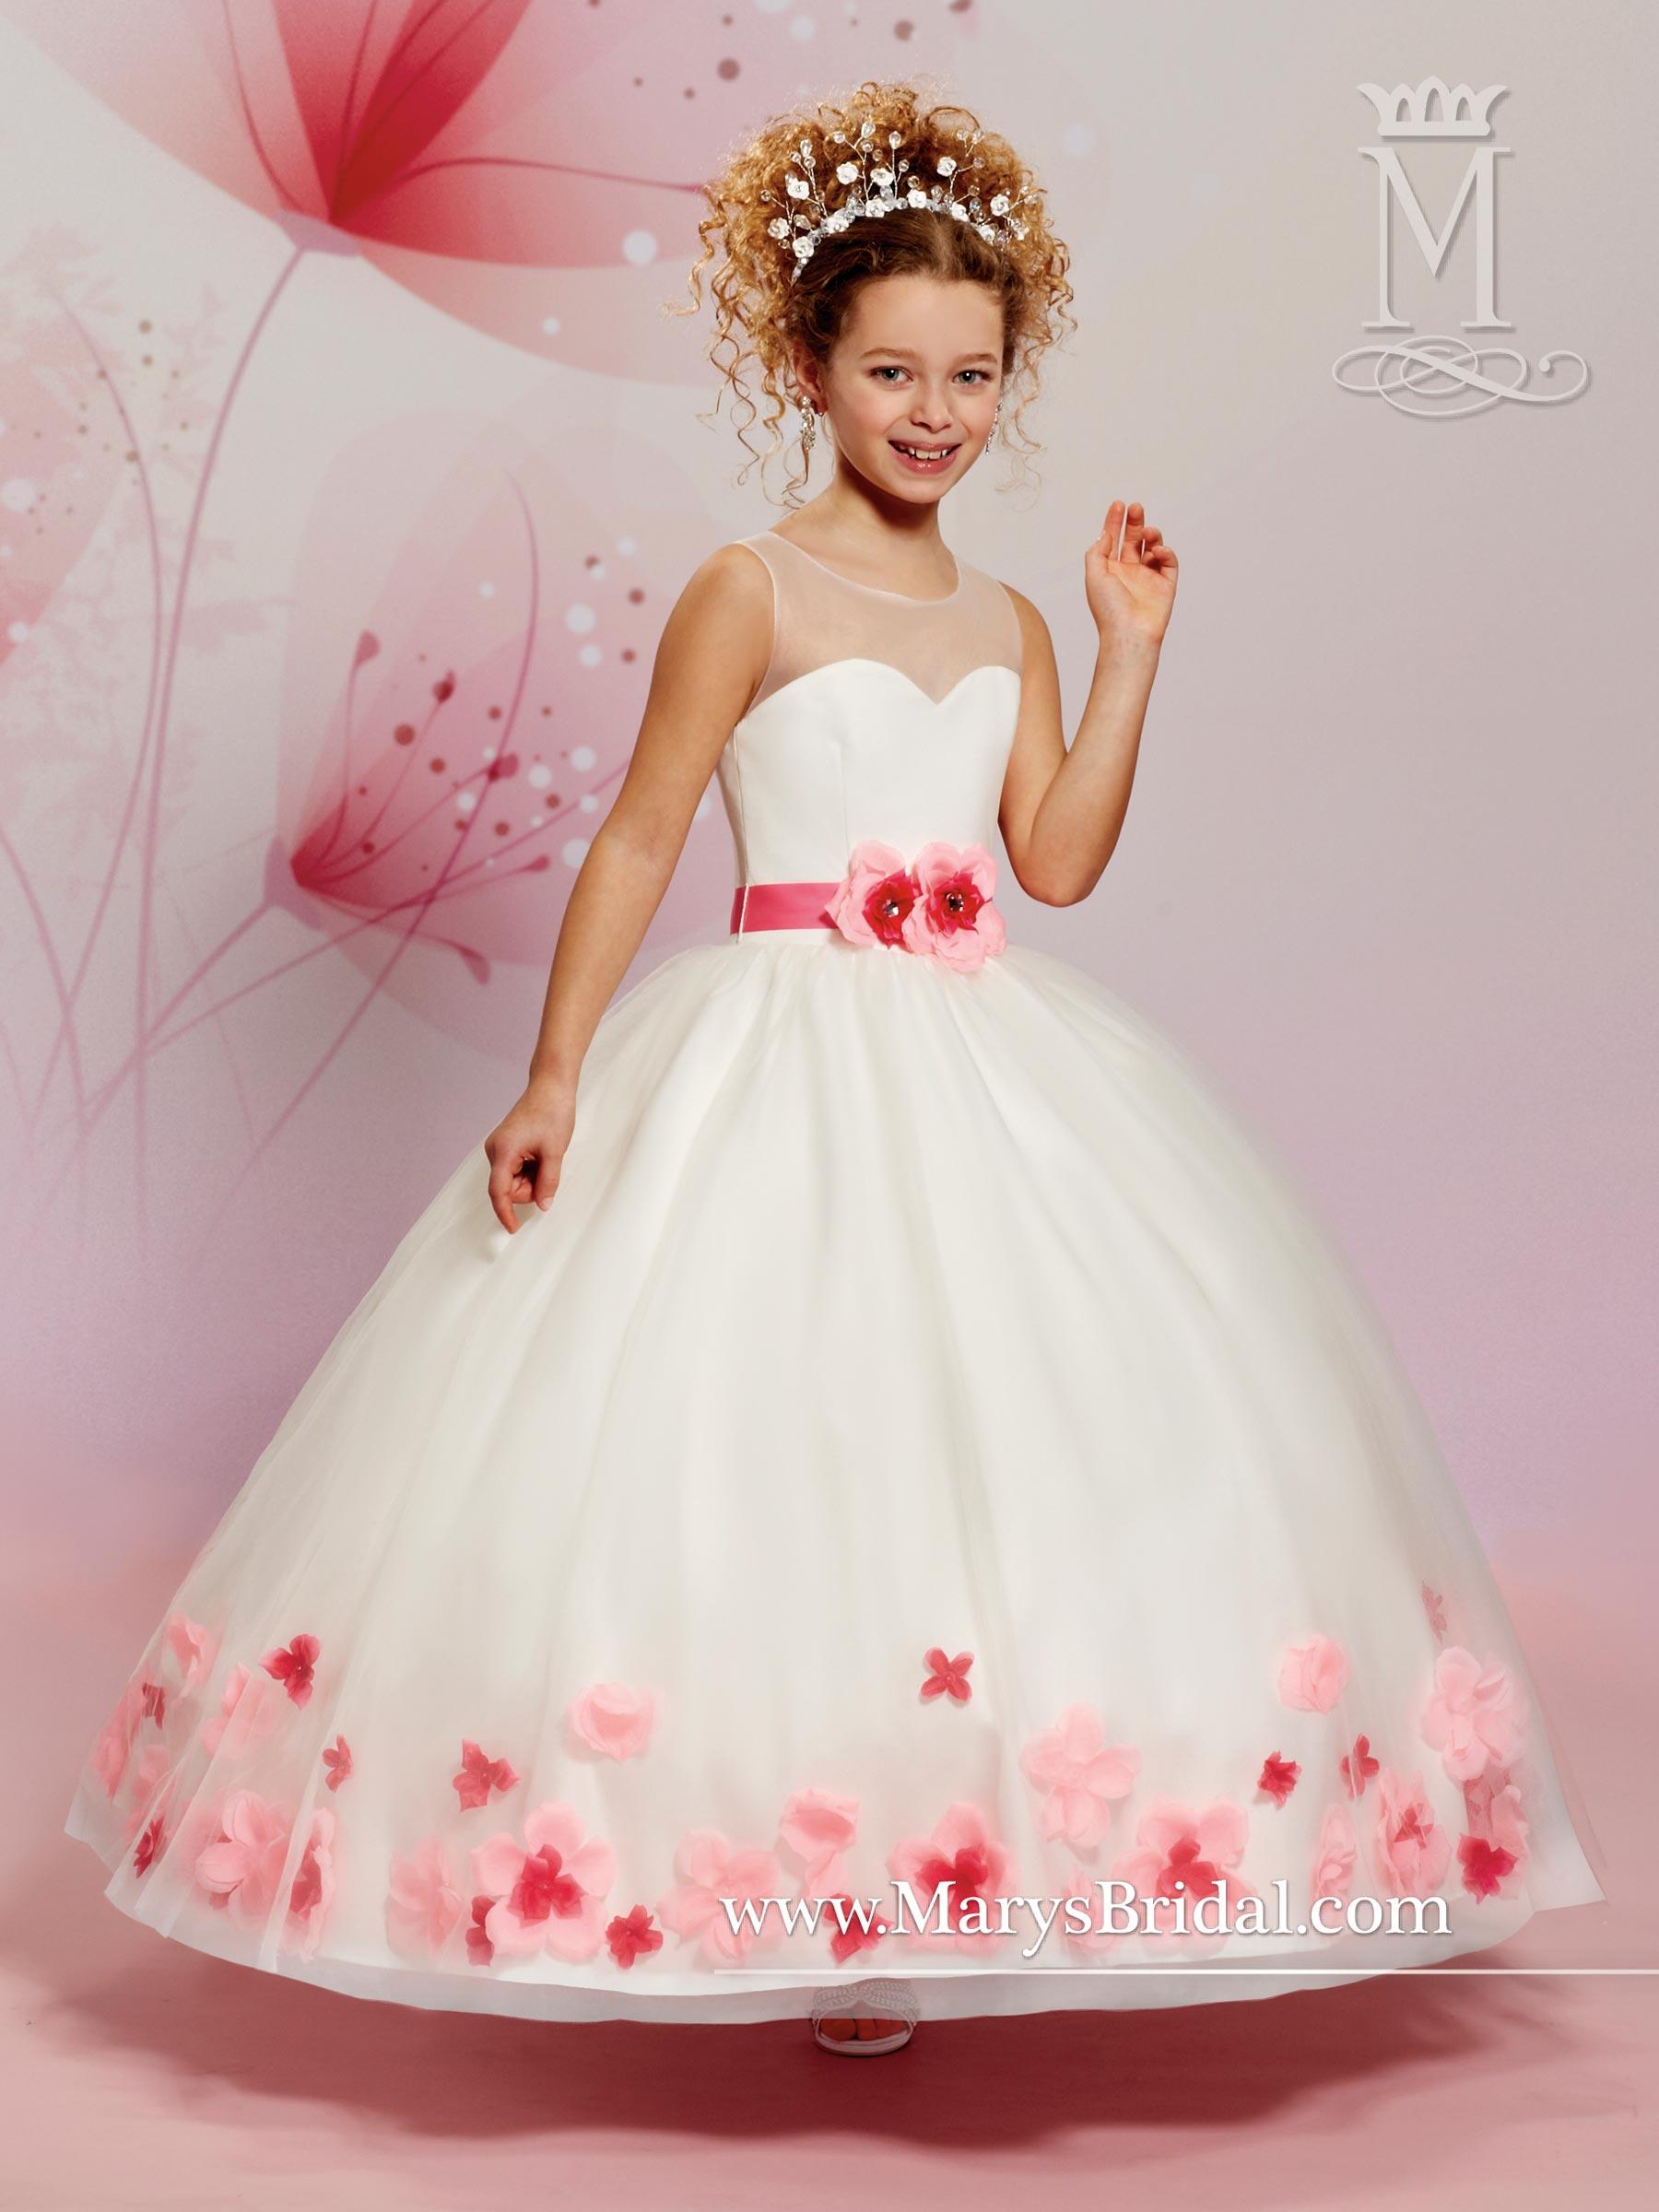 Angel flower girl dresses style f470 in ivorypink white color angel flower girl dresses marys angels style f470 mightylinksfo Gallery